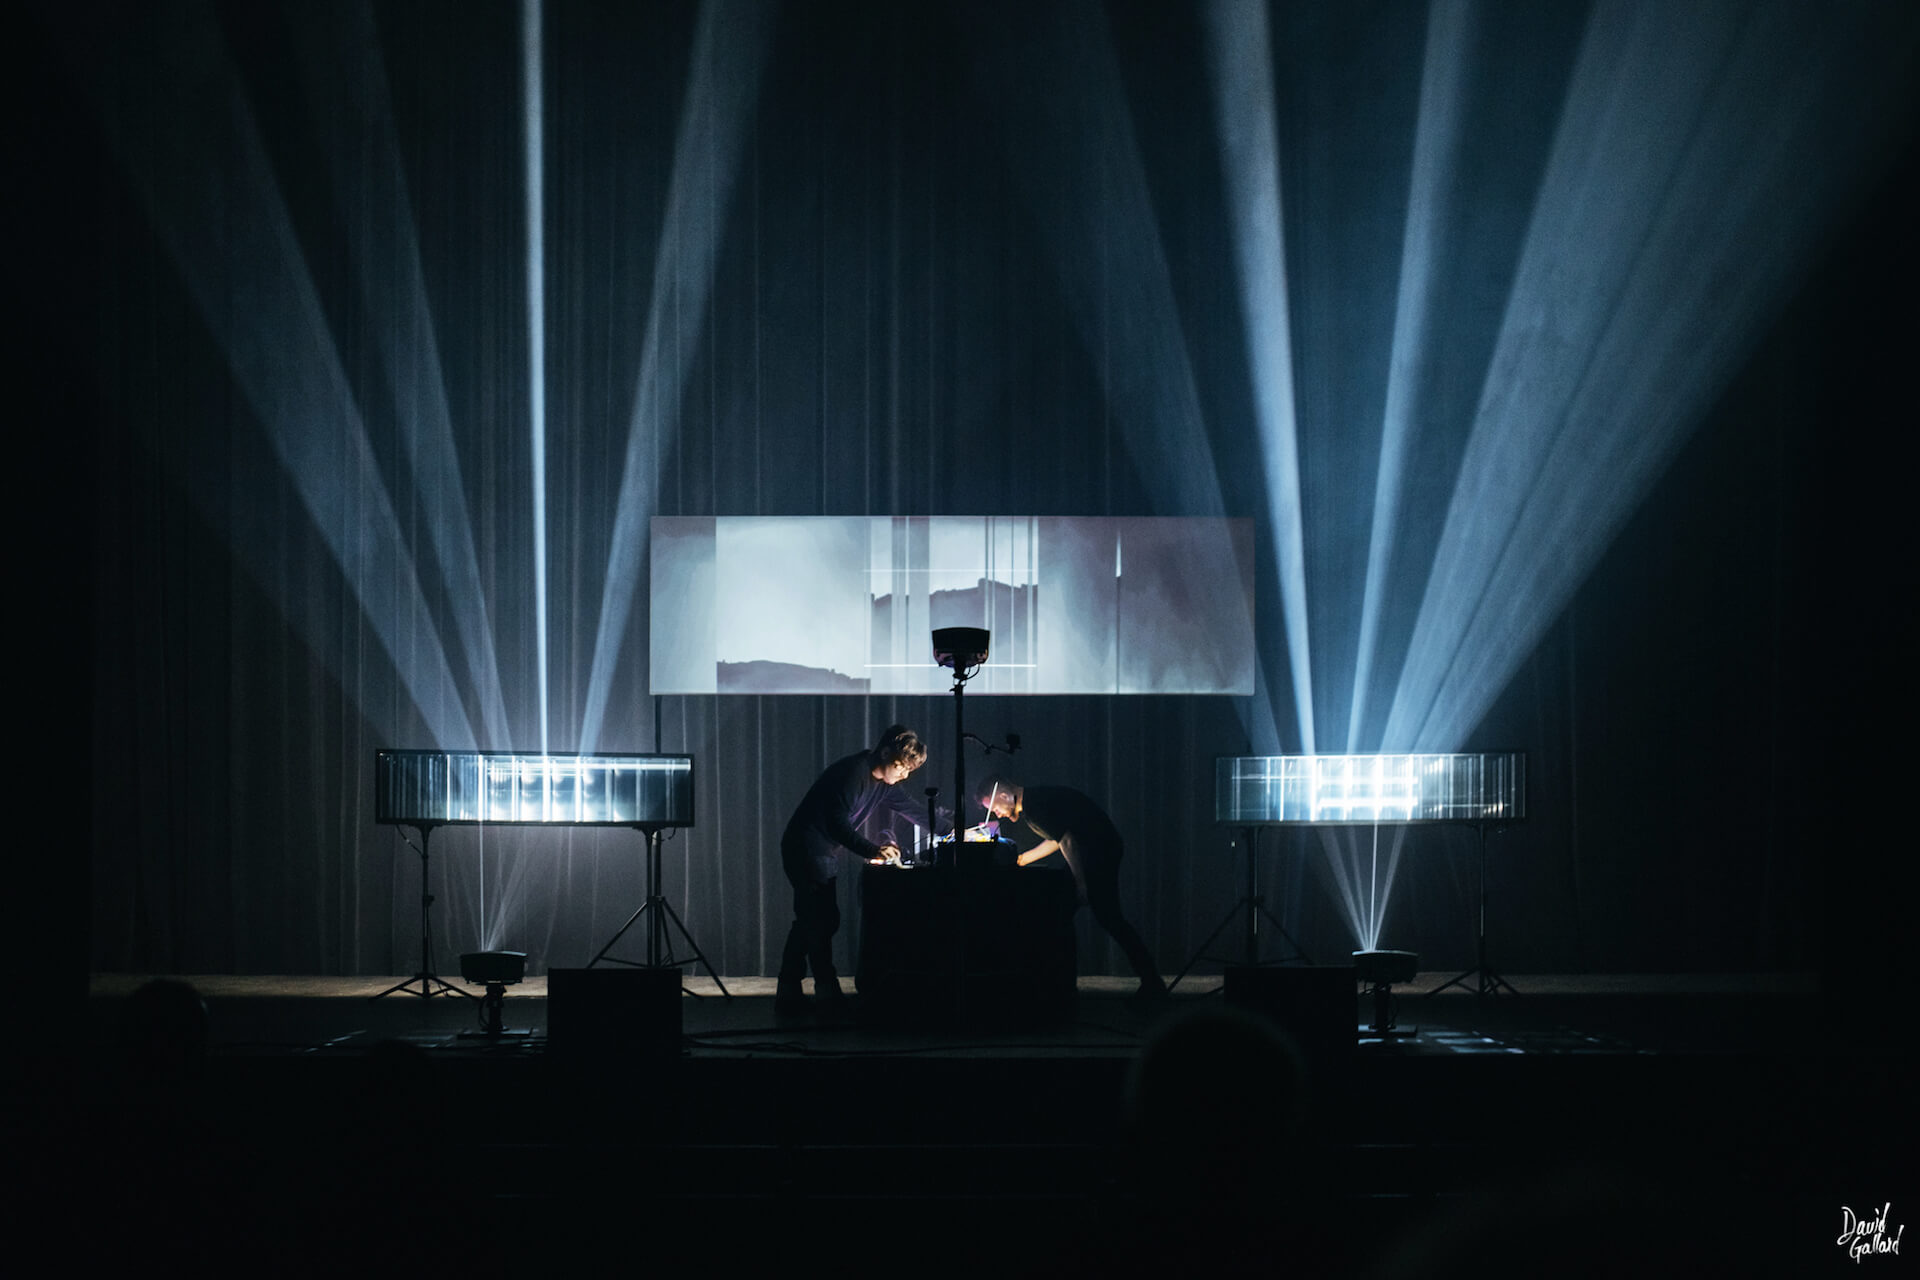 <MUTEK.JP 2019>の第一弾ラインアップにKode9&森本晃司、Tim Hecker、真鍋大度、中山晃子らが発表 music190926-mutek-4